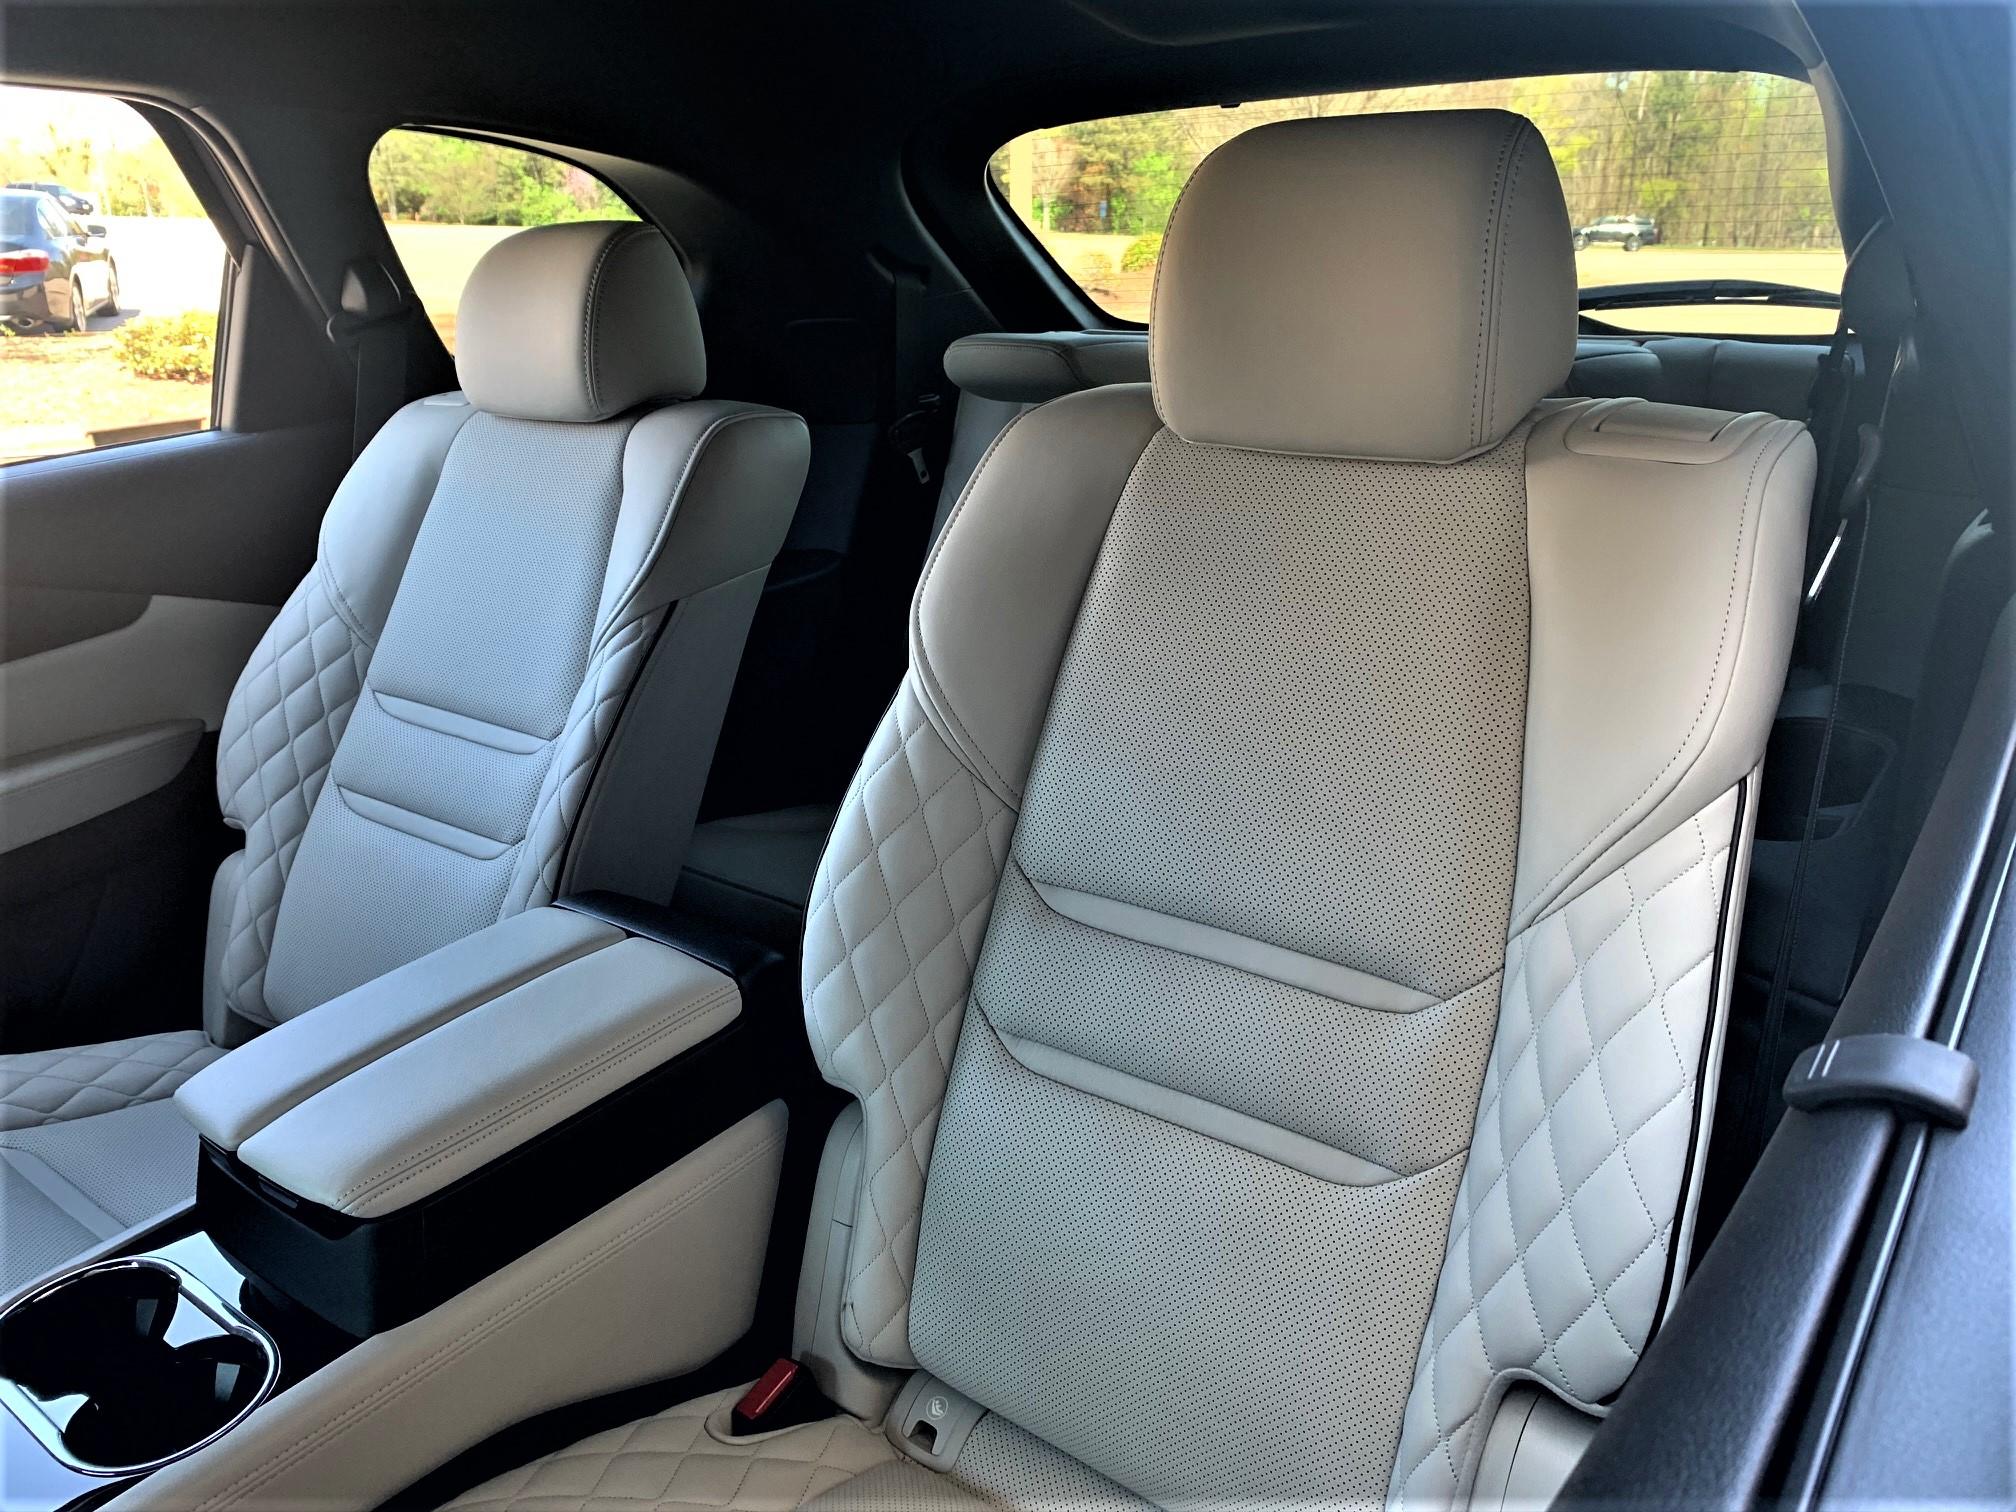 Mazda CX-9 second-row seats